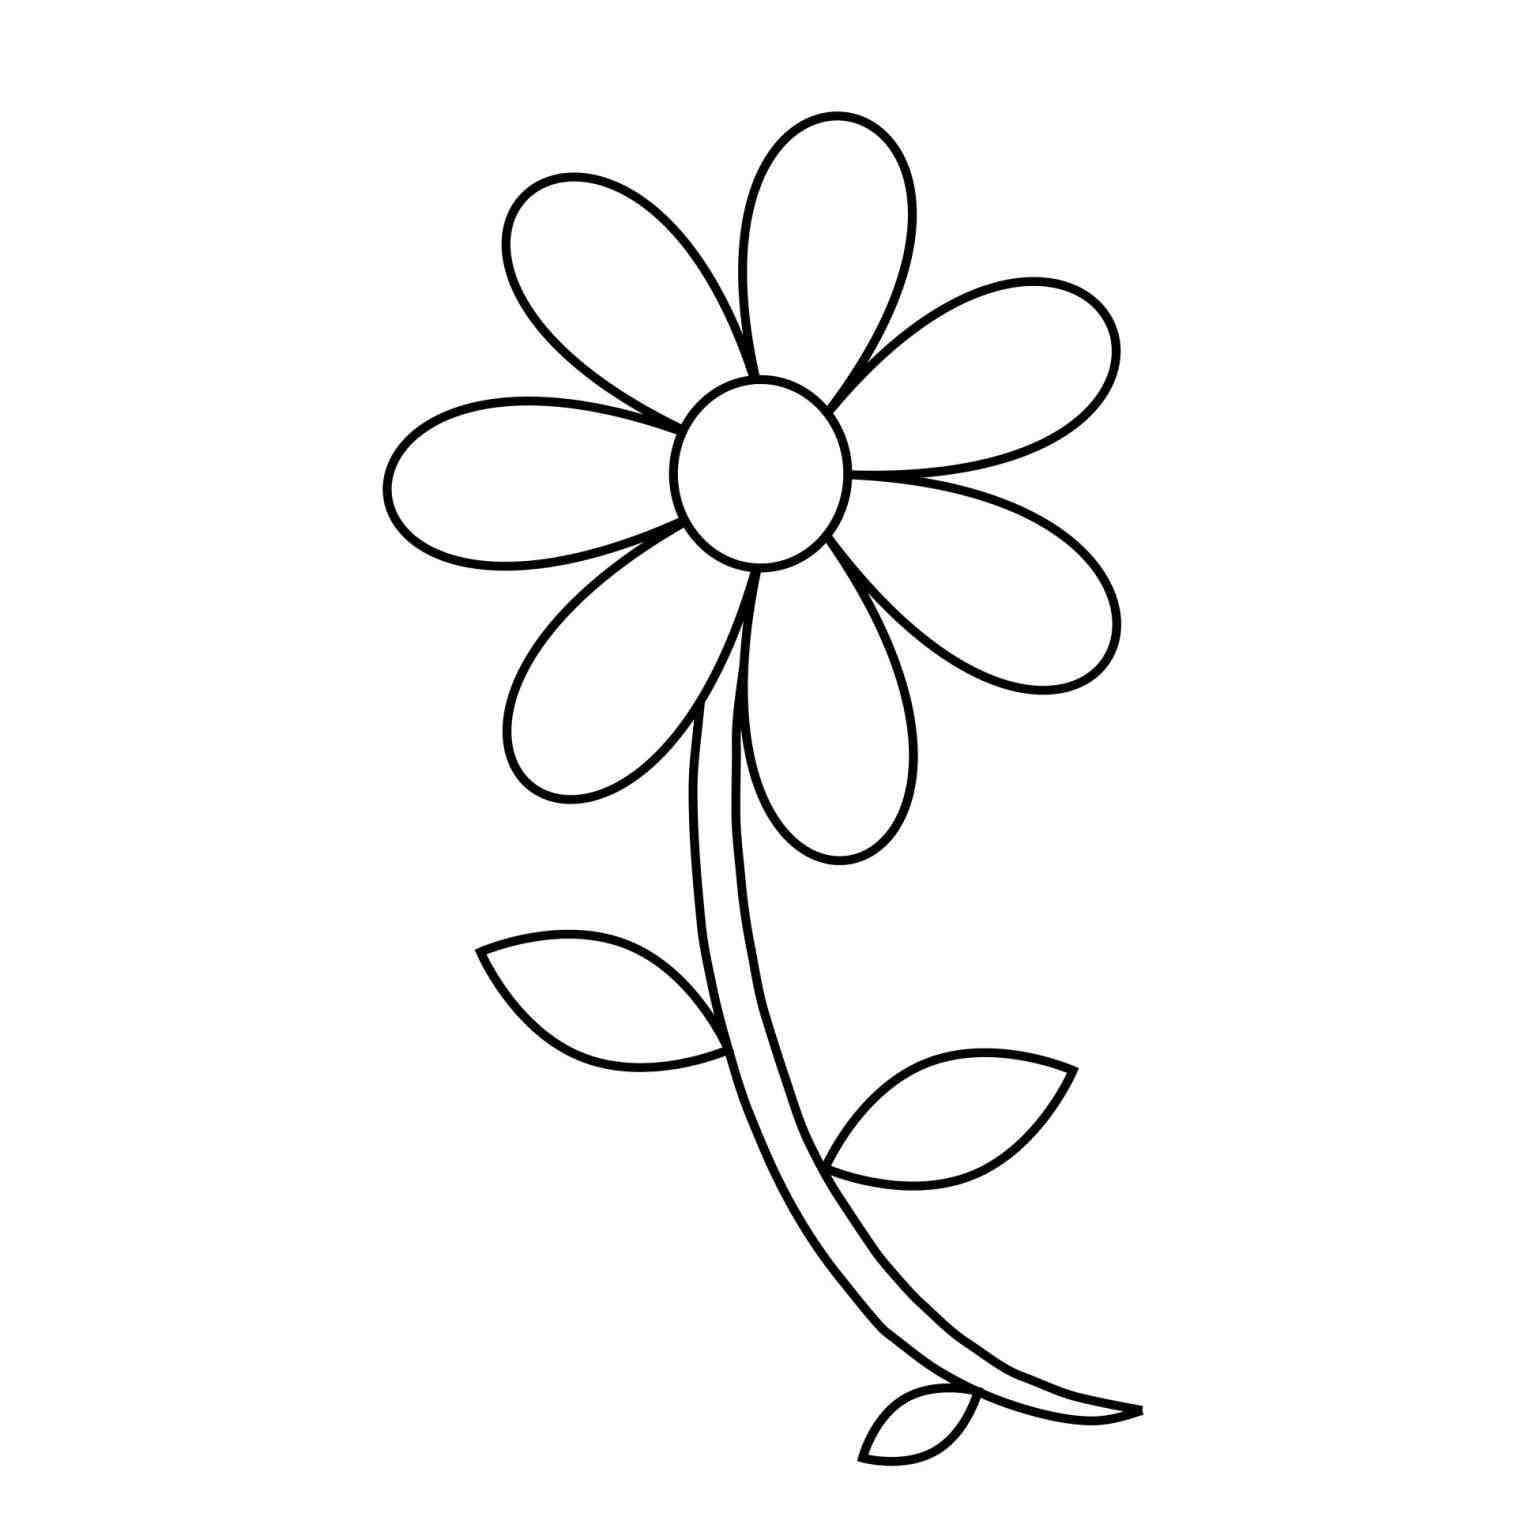 1514x1517 Simple Flower Drawings For Beginners